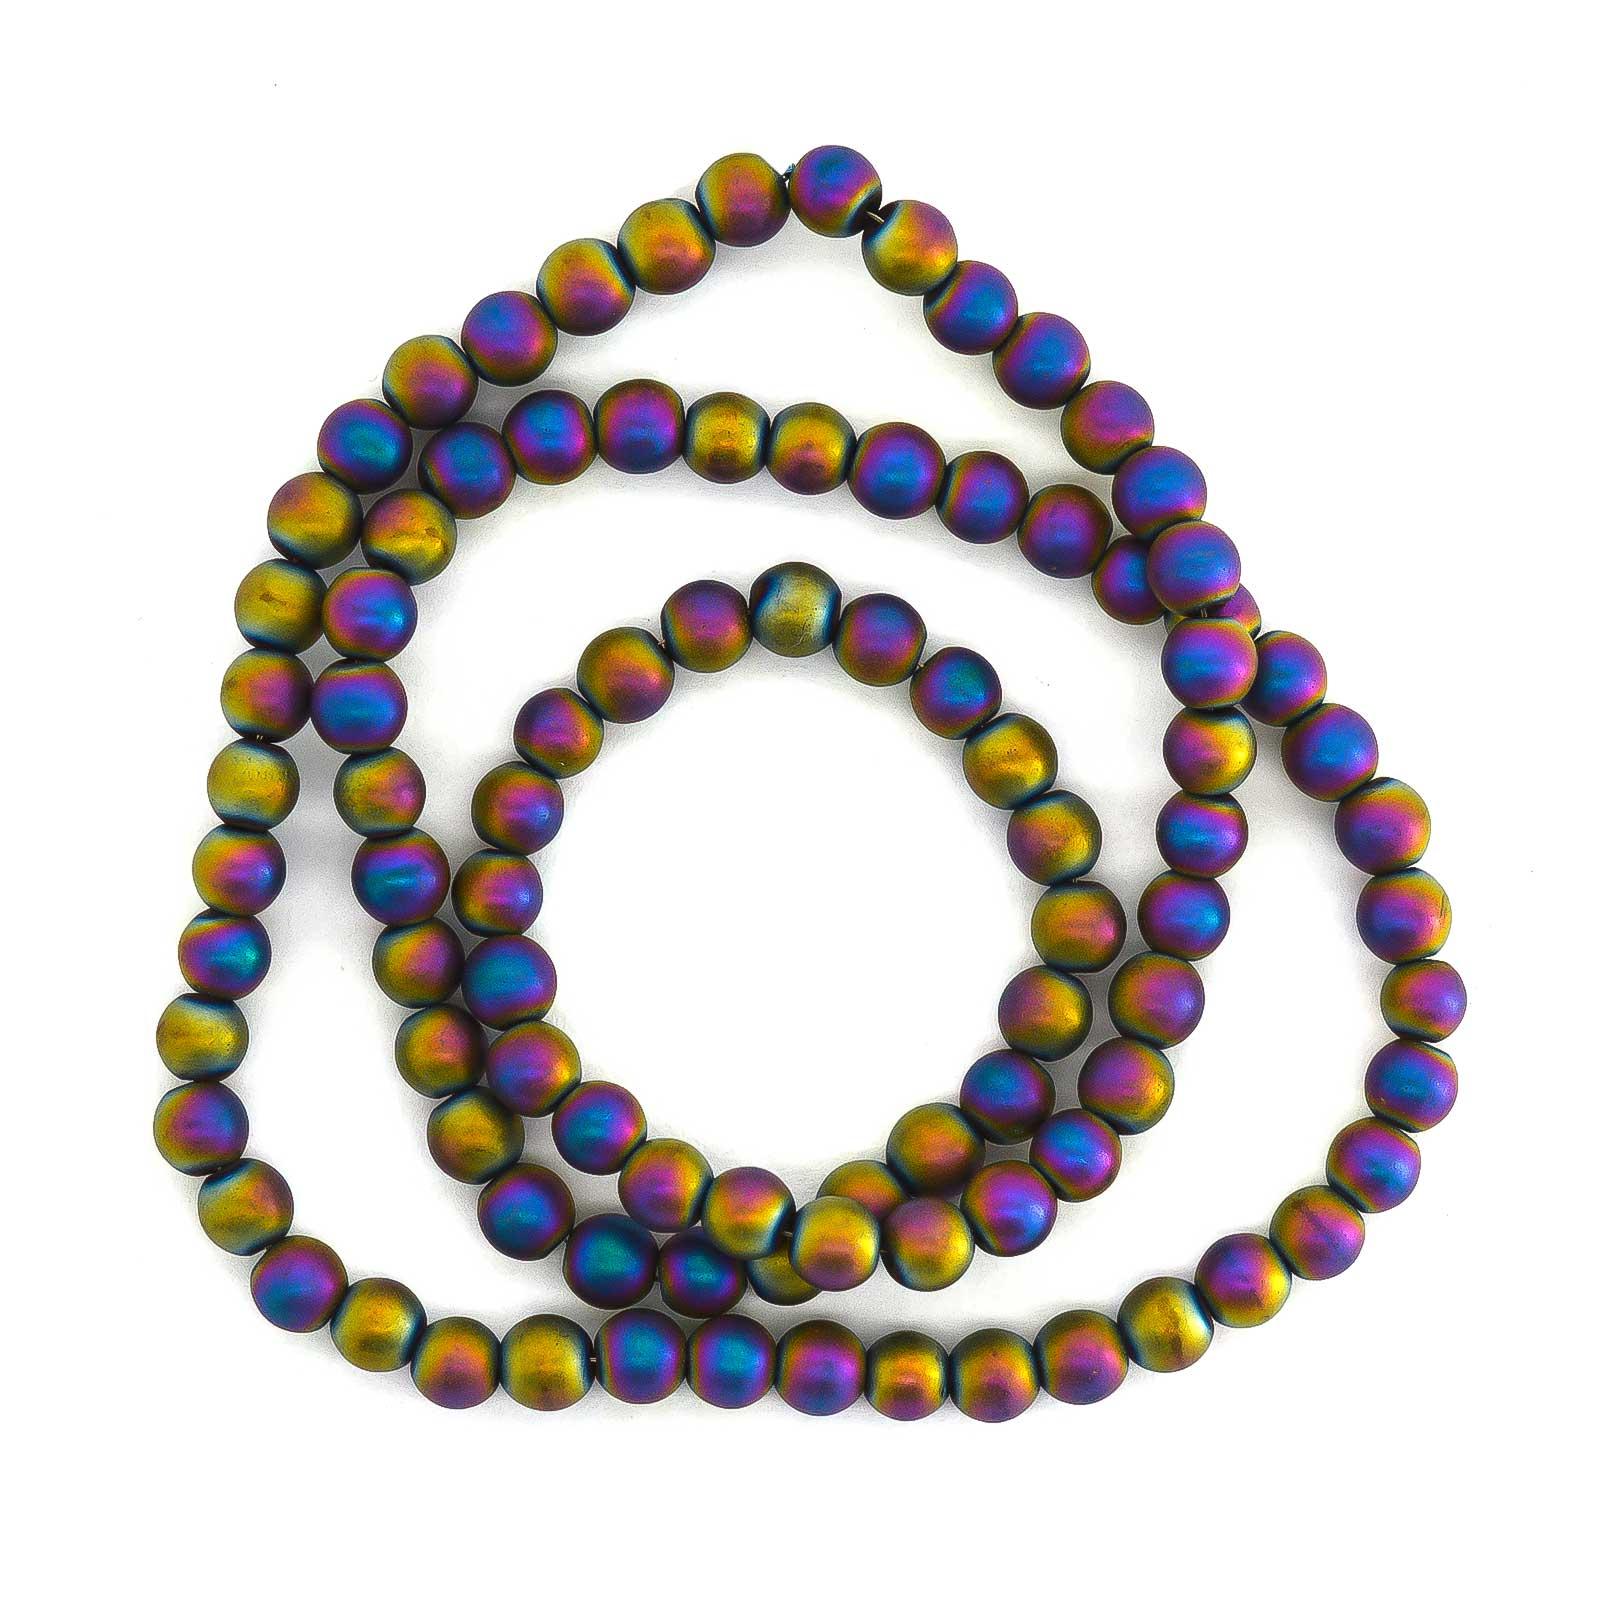 1 Strang Hämatit-Perlen Pfeile Kugel Würfel Schmuckperlen verschiedene Formen Farbwahl – Bild 6